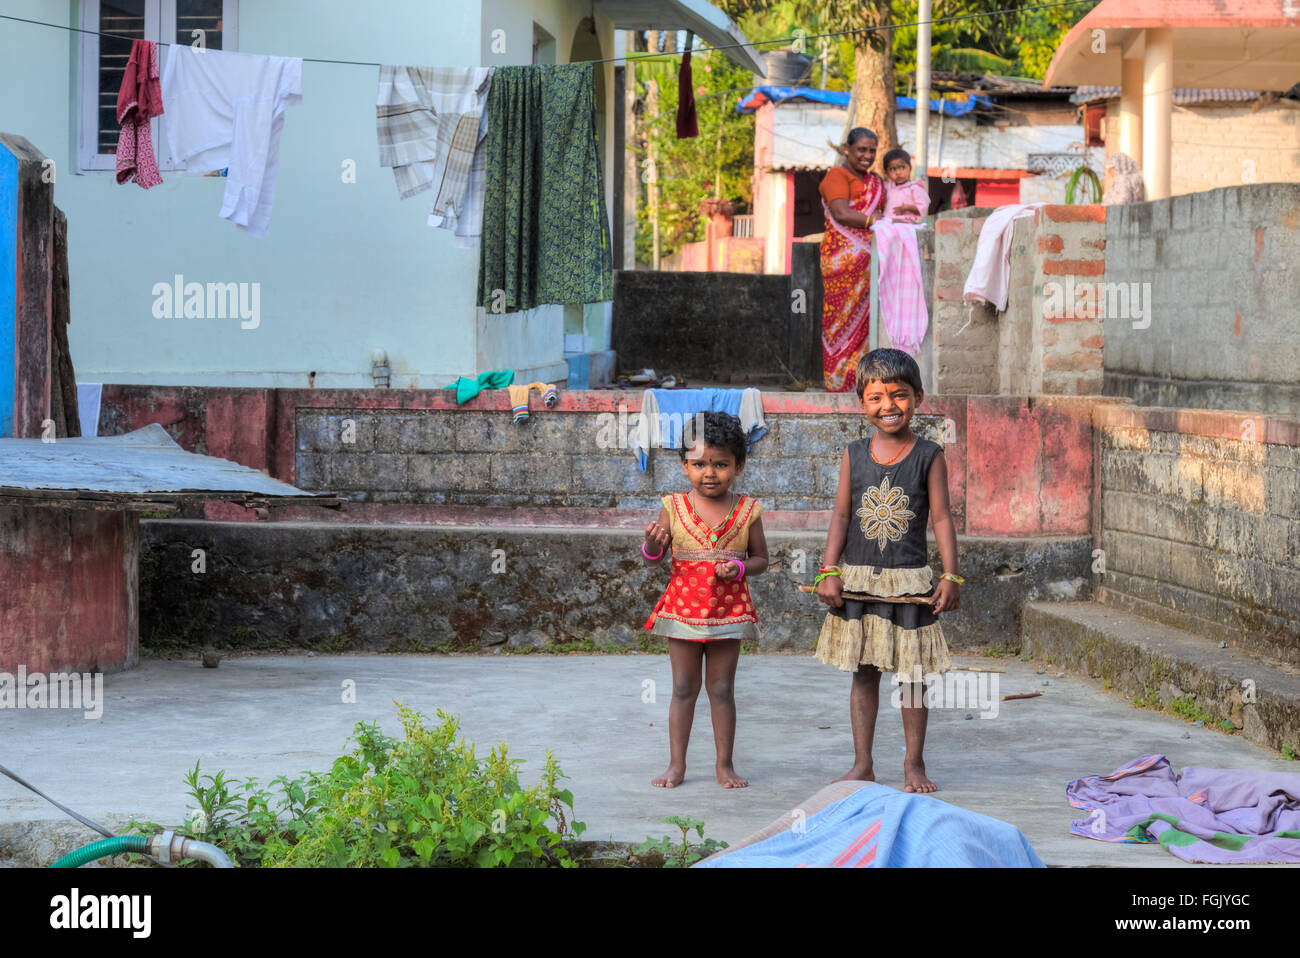 rural life in Thekkady, Periyar, Kerala, South India Stock Photo